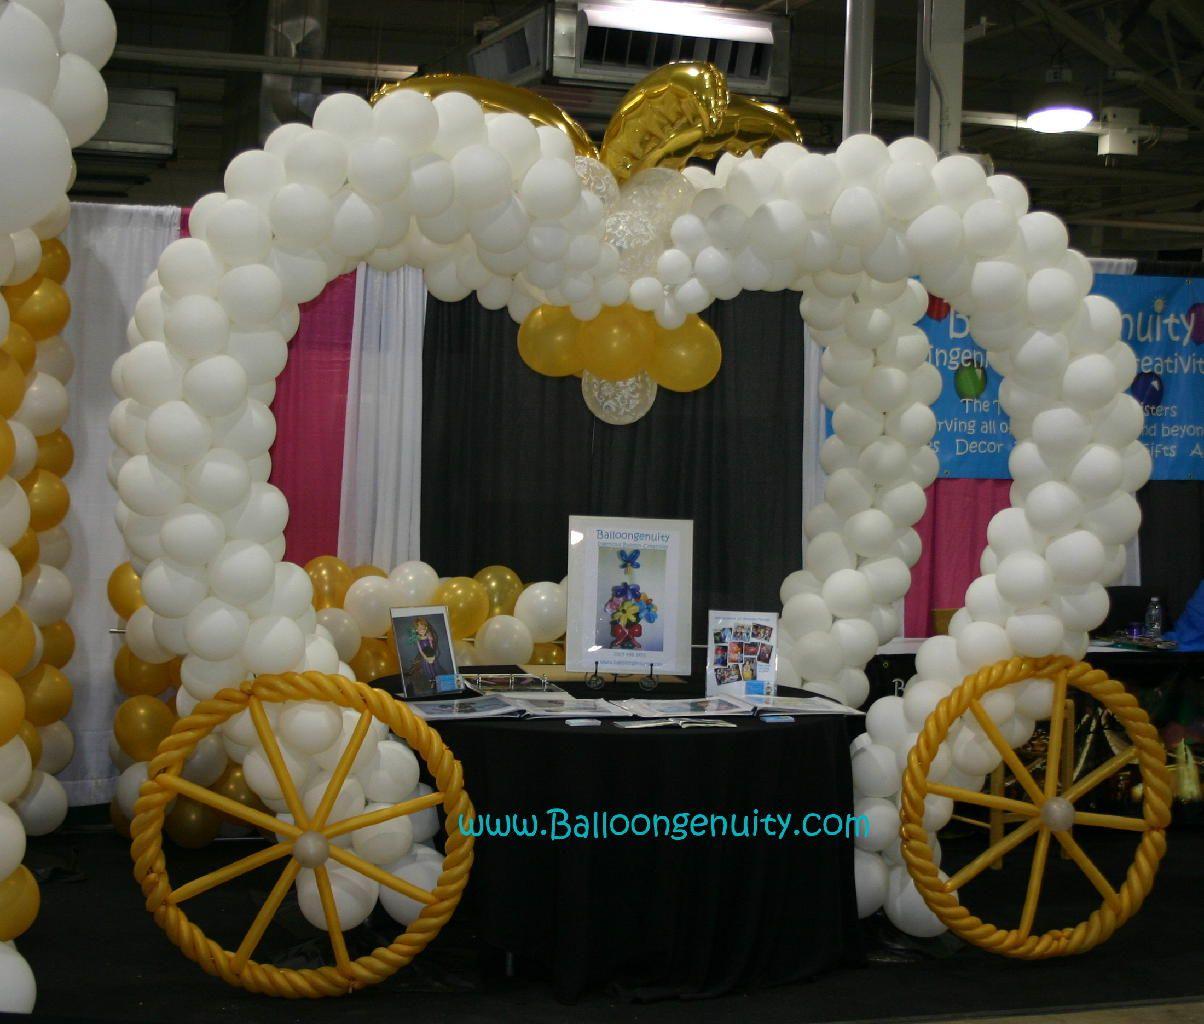 Princess Balloon Decoration Balloon Carriage Wedding Balloon Decor Huwelijk Trouwen